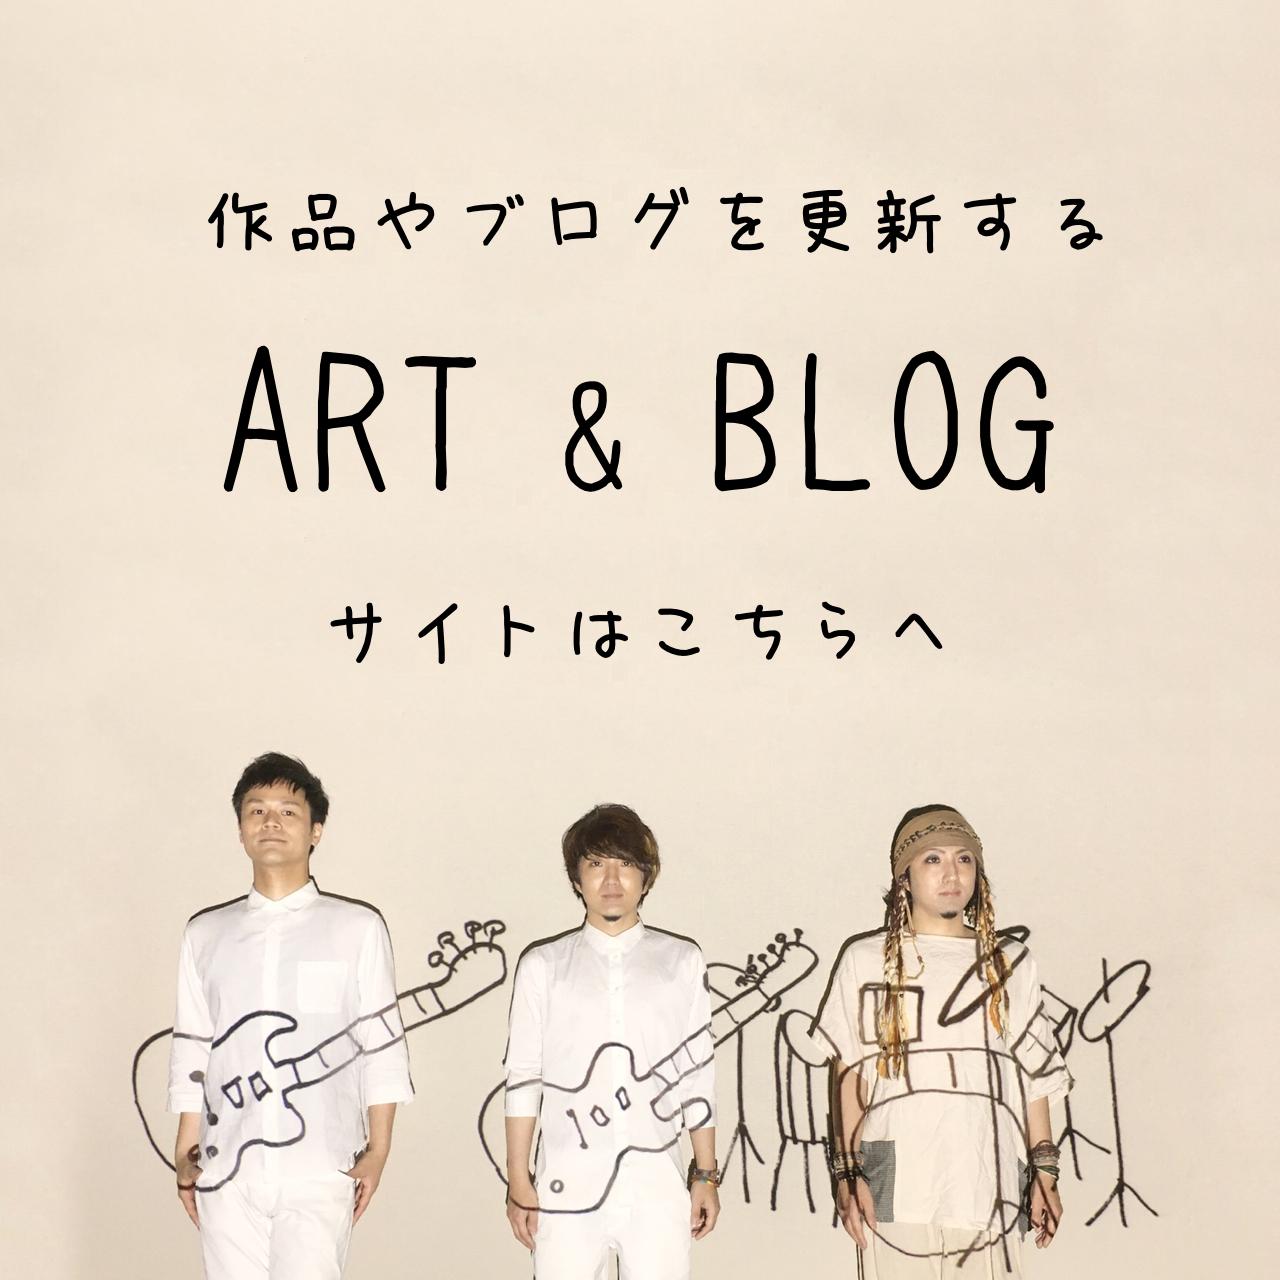 Art & Blog